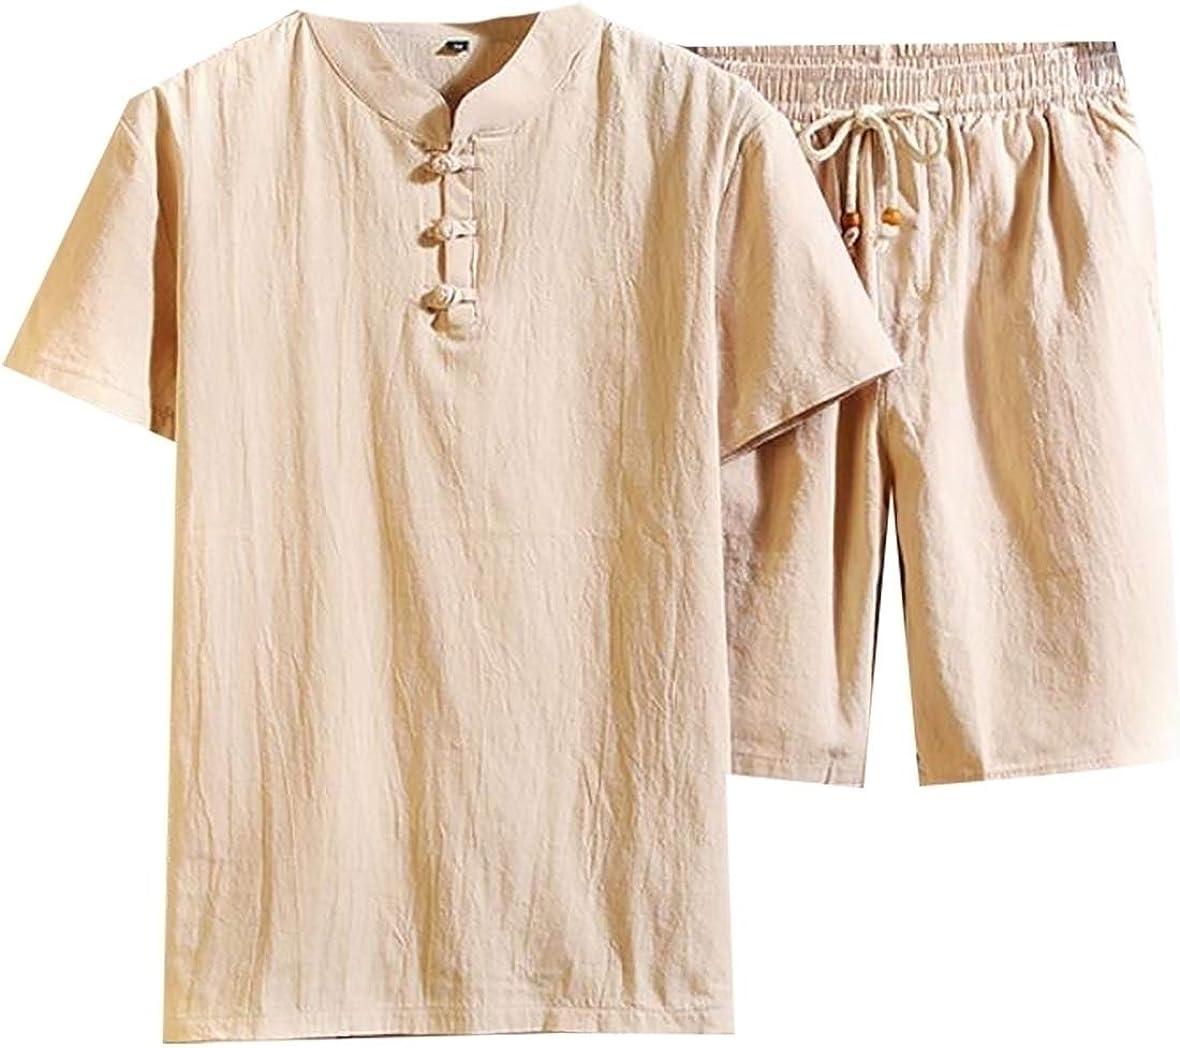 Xswsy XG Mens Shorts Leisure Linen Slim T-Shirt 2PCS Sets Solid Outfits